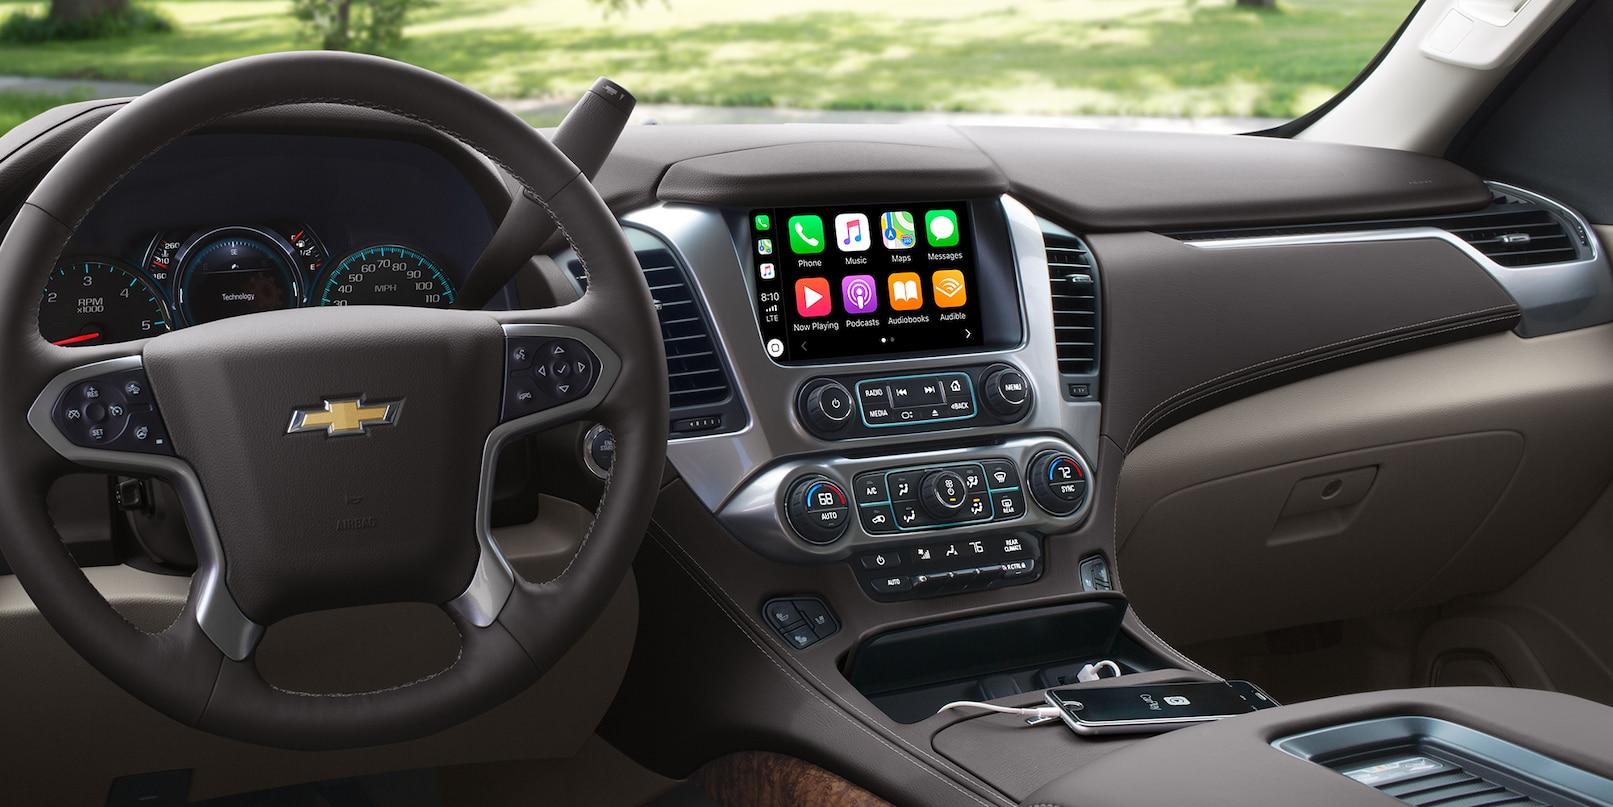 Interior of the 2019 Chevrolet Suburban